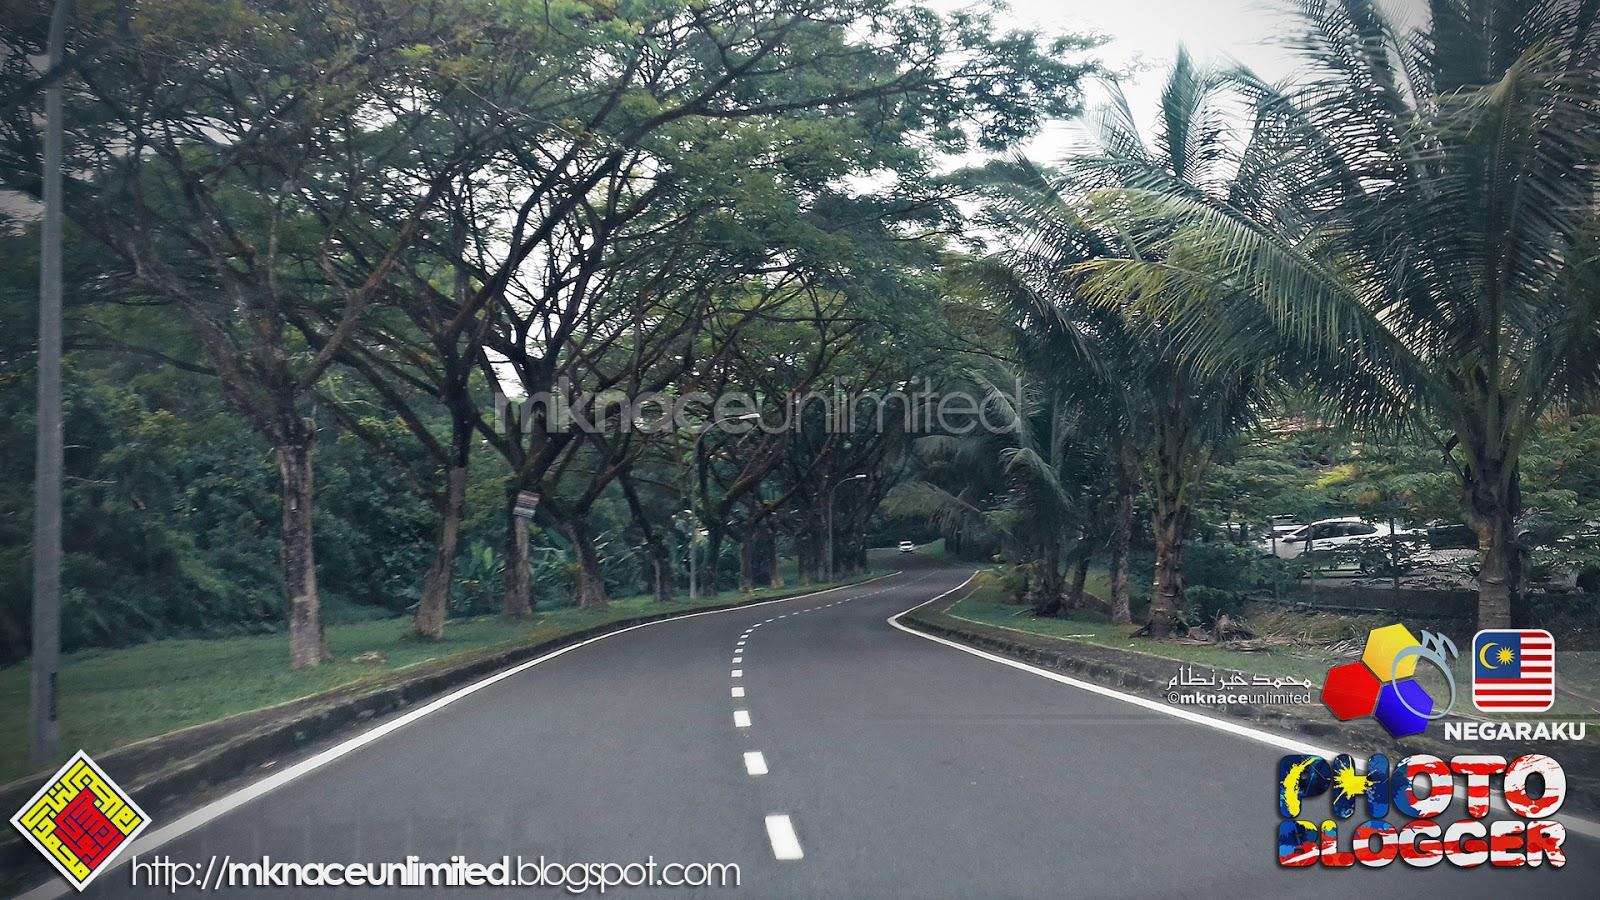 Sekolah Tun Fatimah 20170714 Outing Day Mknace Unlimited The Tcash Vaganza 32 Milo Malaysia Activ Go Patah Balik Semula